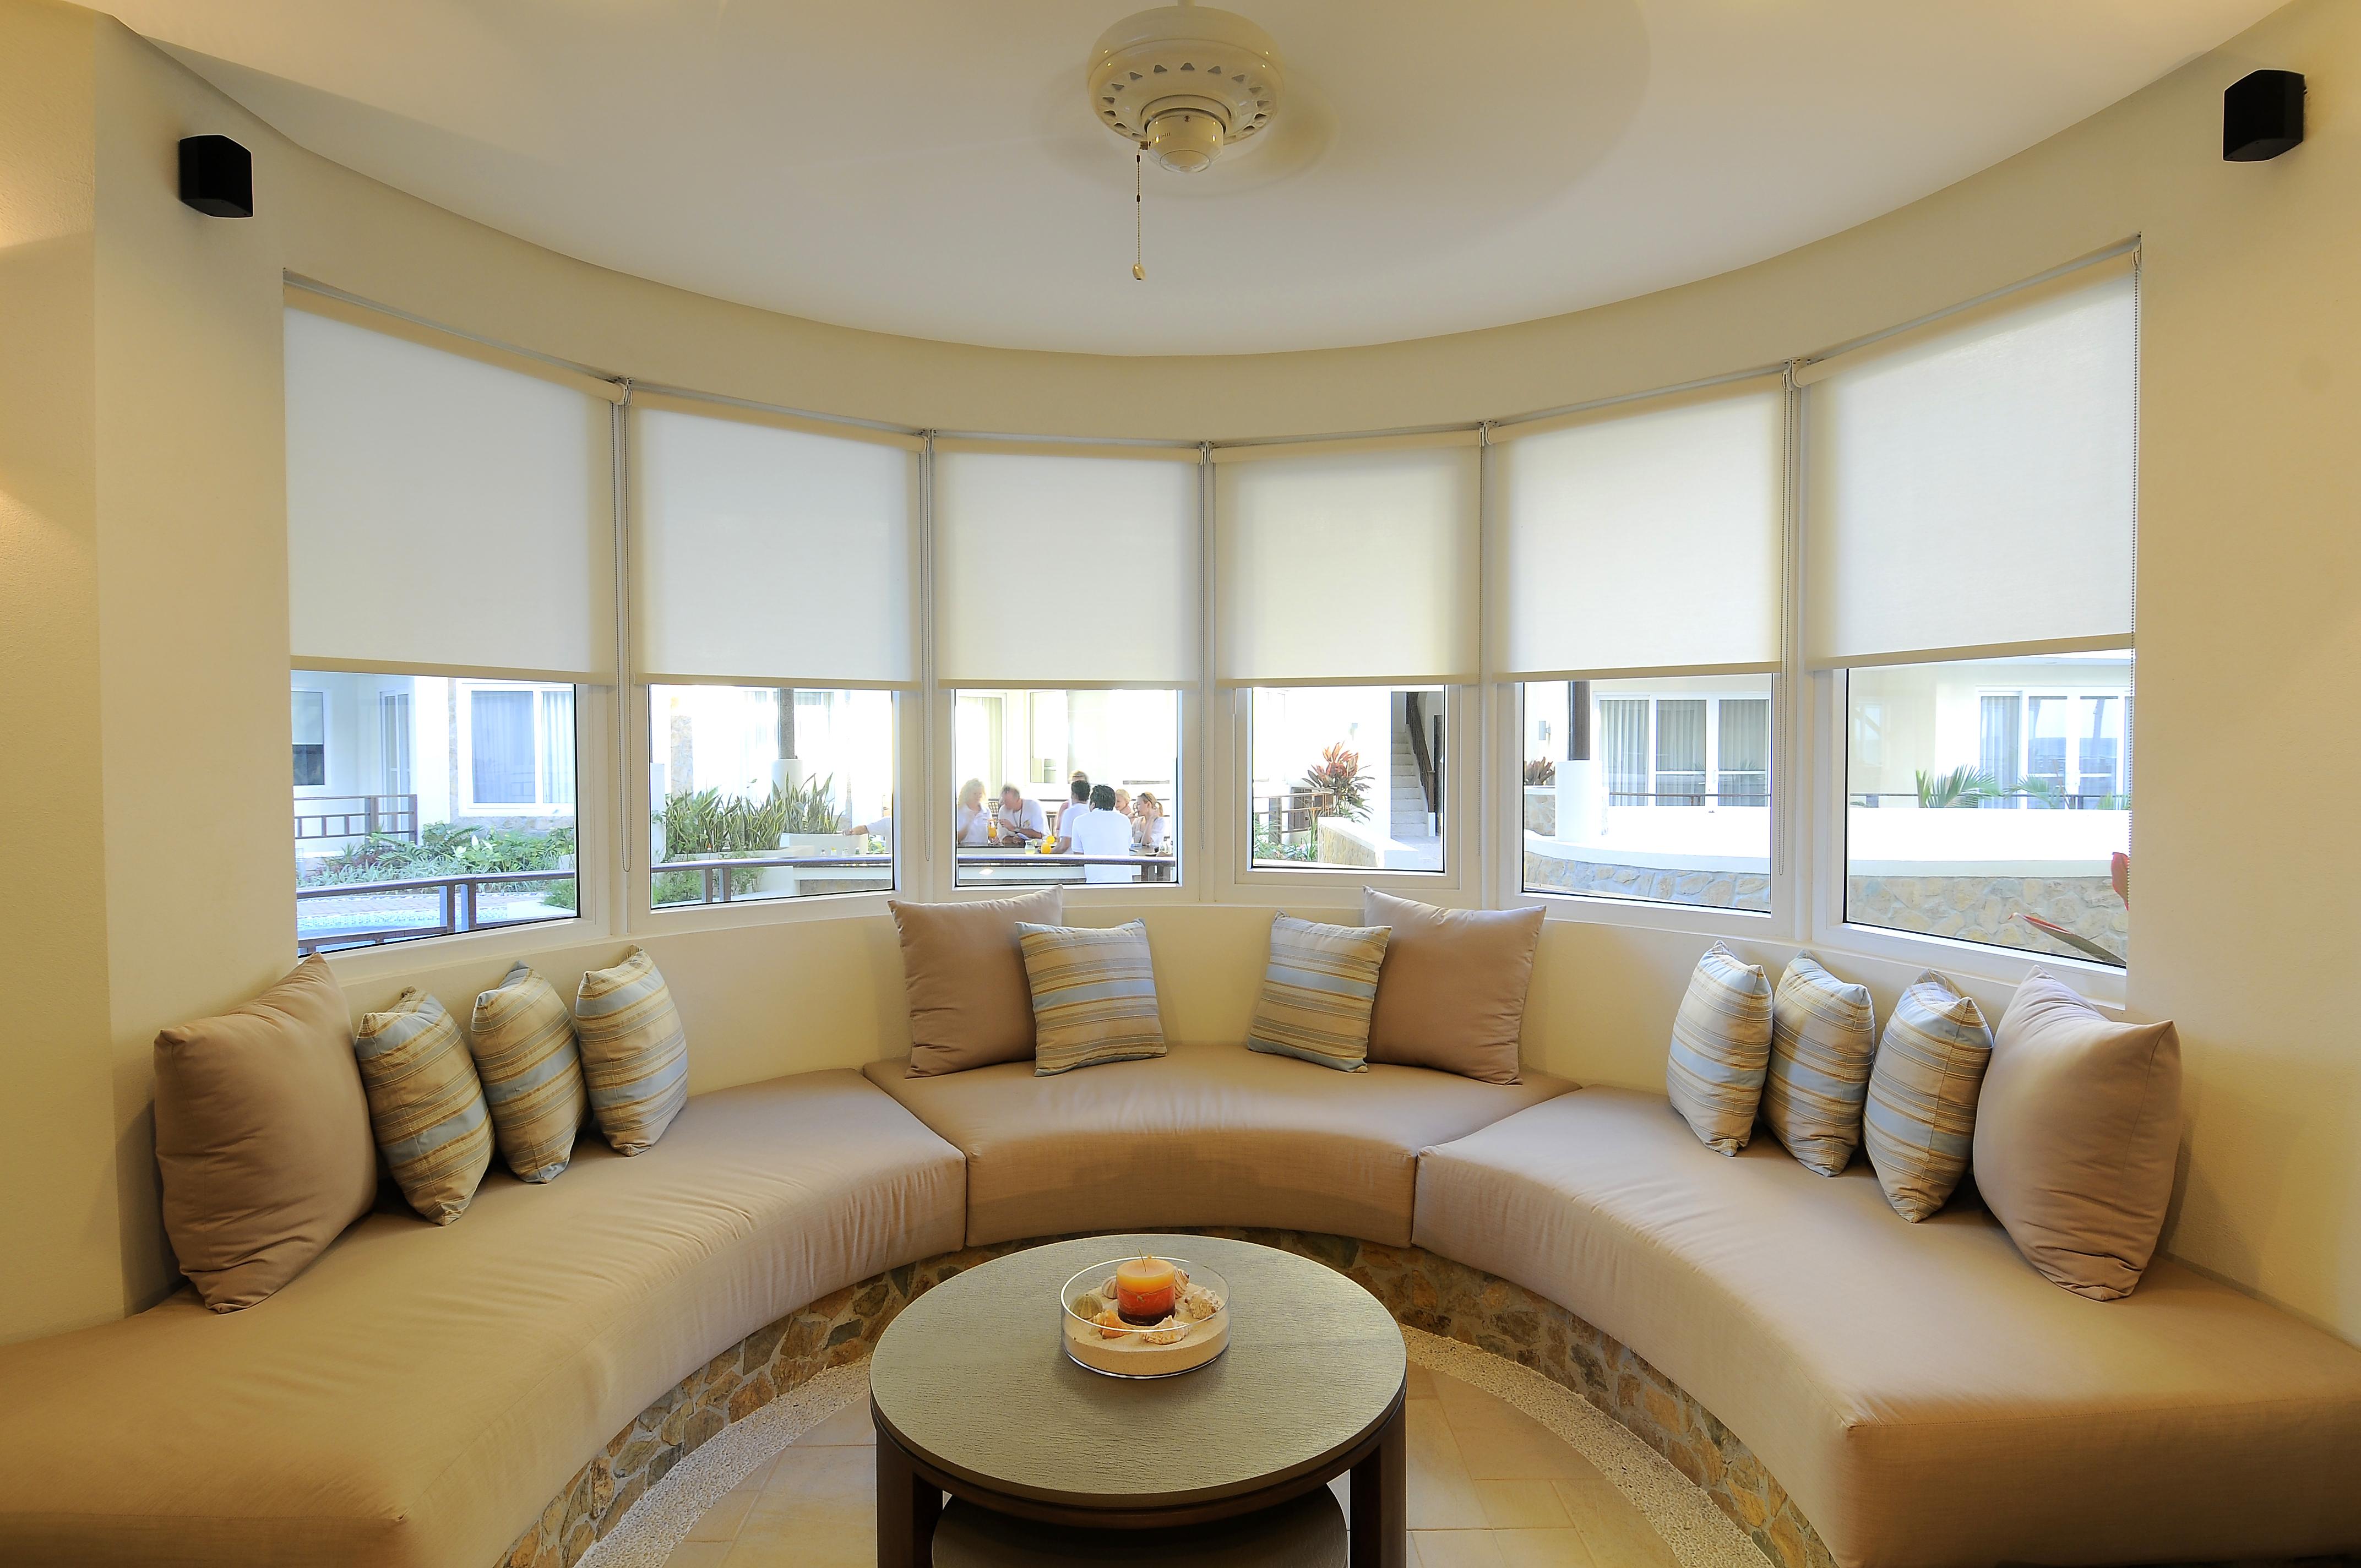 7Stones Boracay Suites - Boracay Resort Philippines (www.7stone**oracay.com)